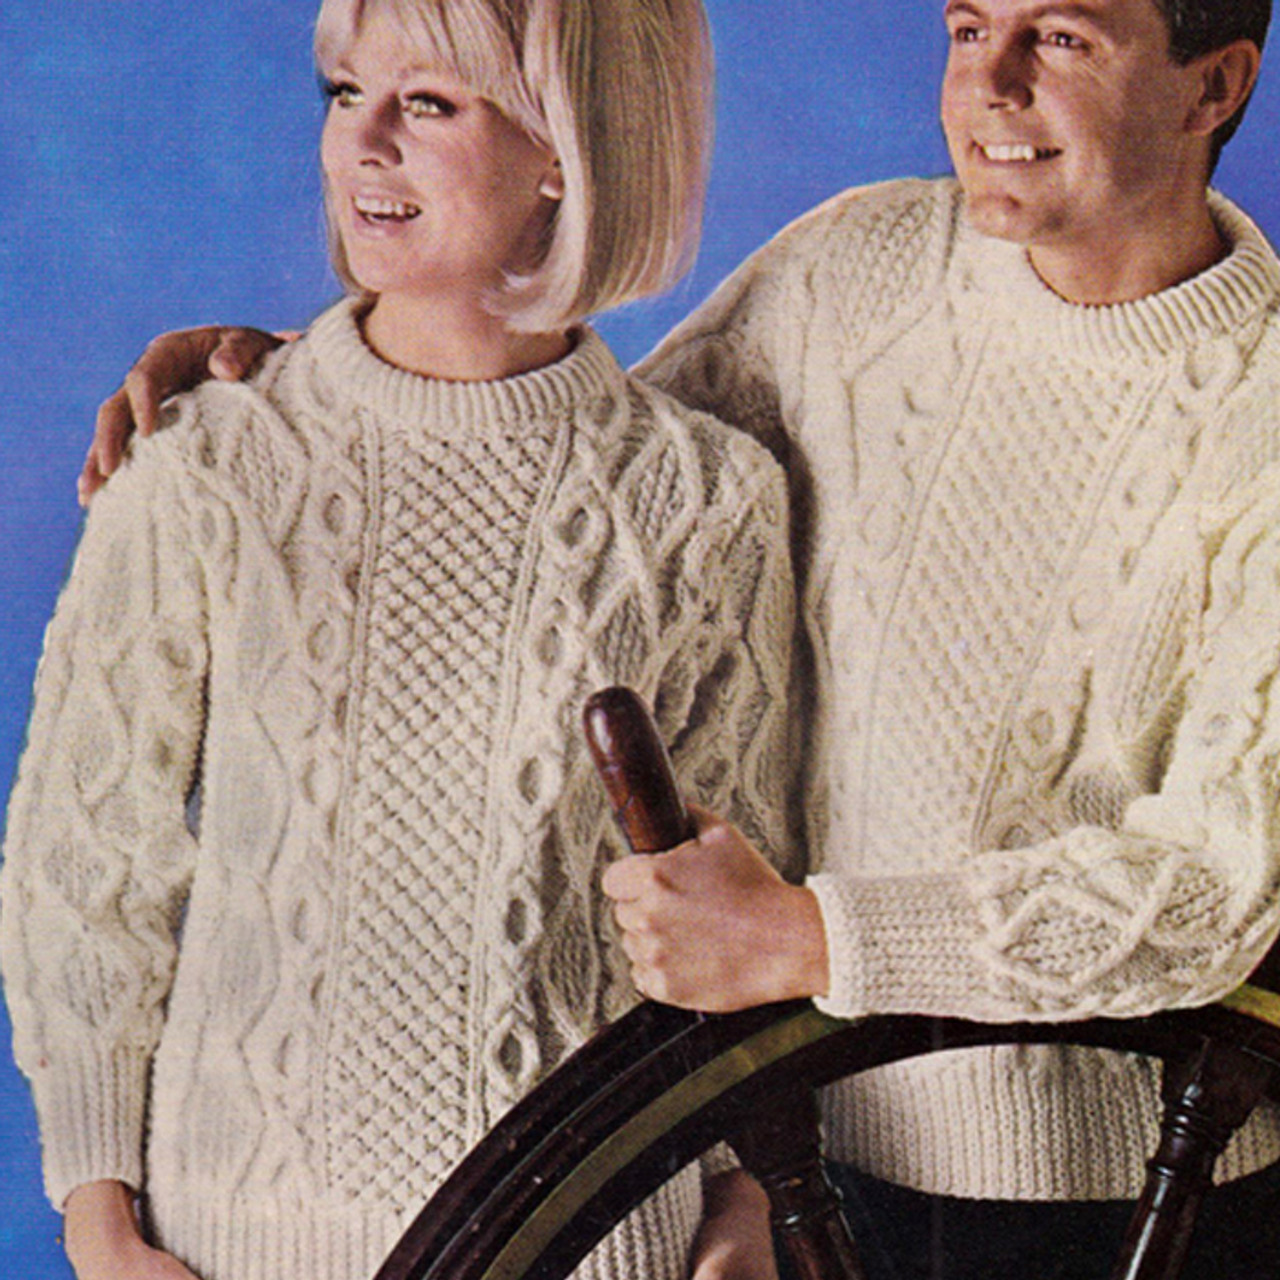 Irish Fisherman Knitted Pullovers Pattern, His & Hers